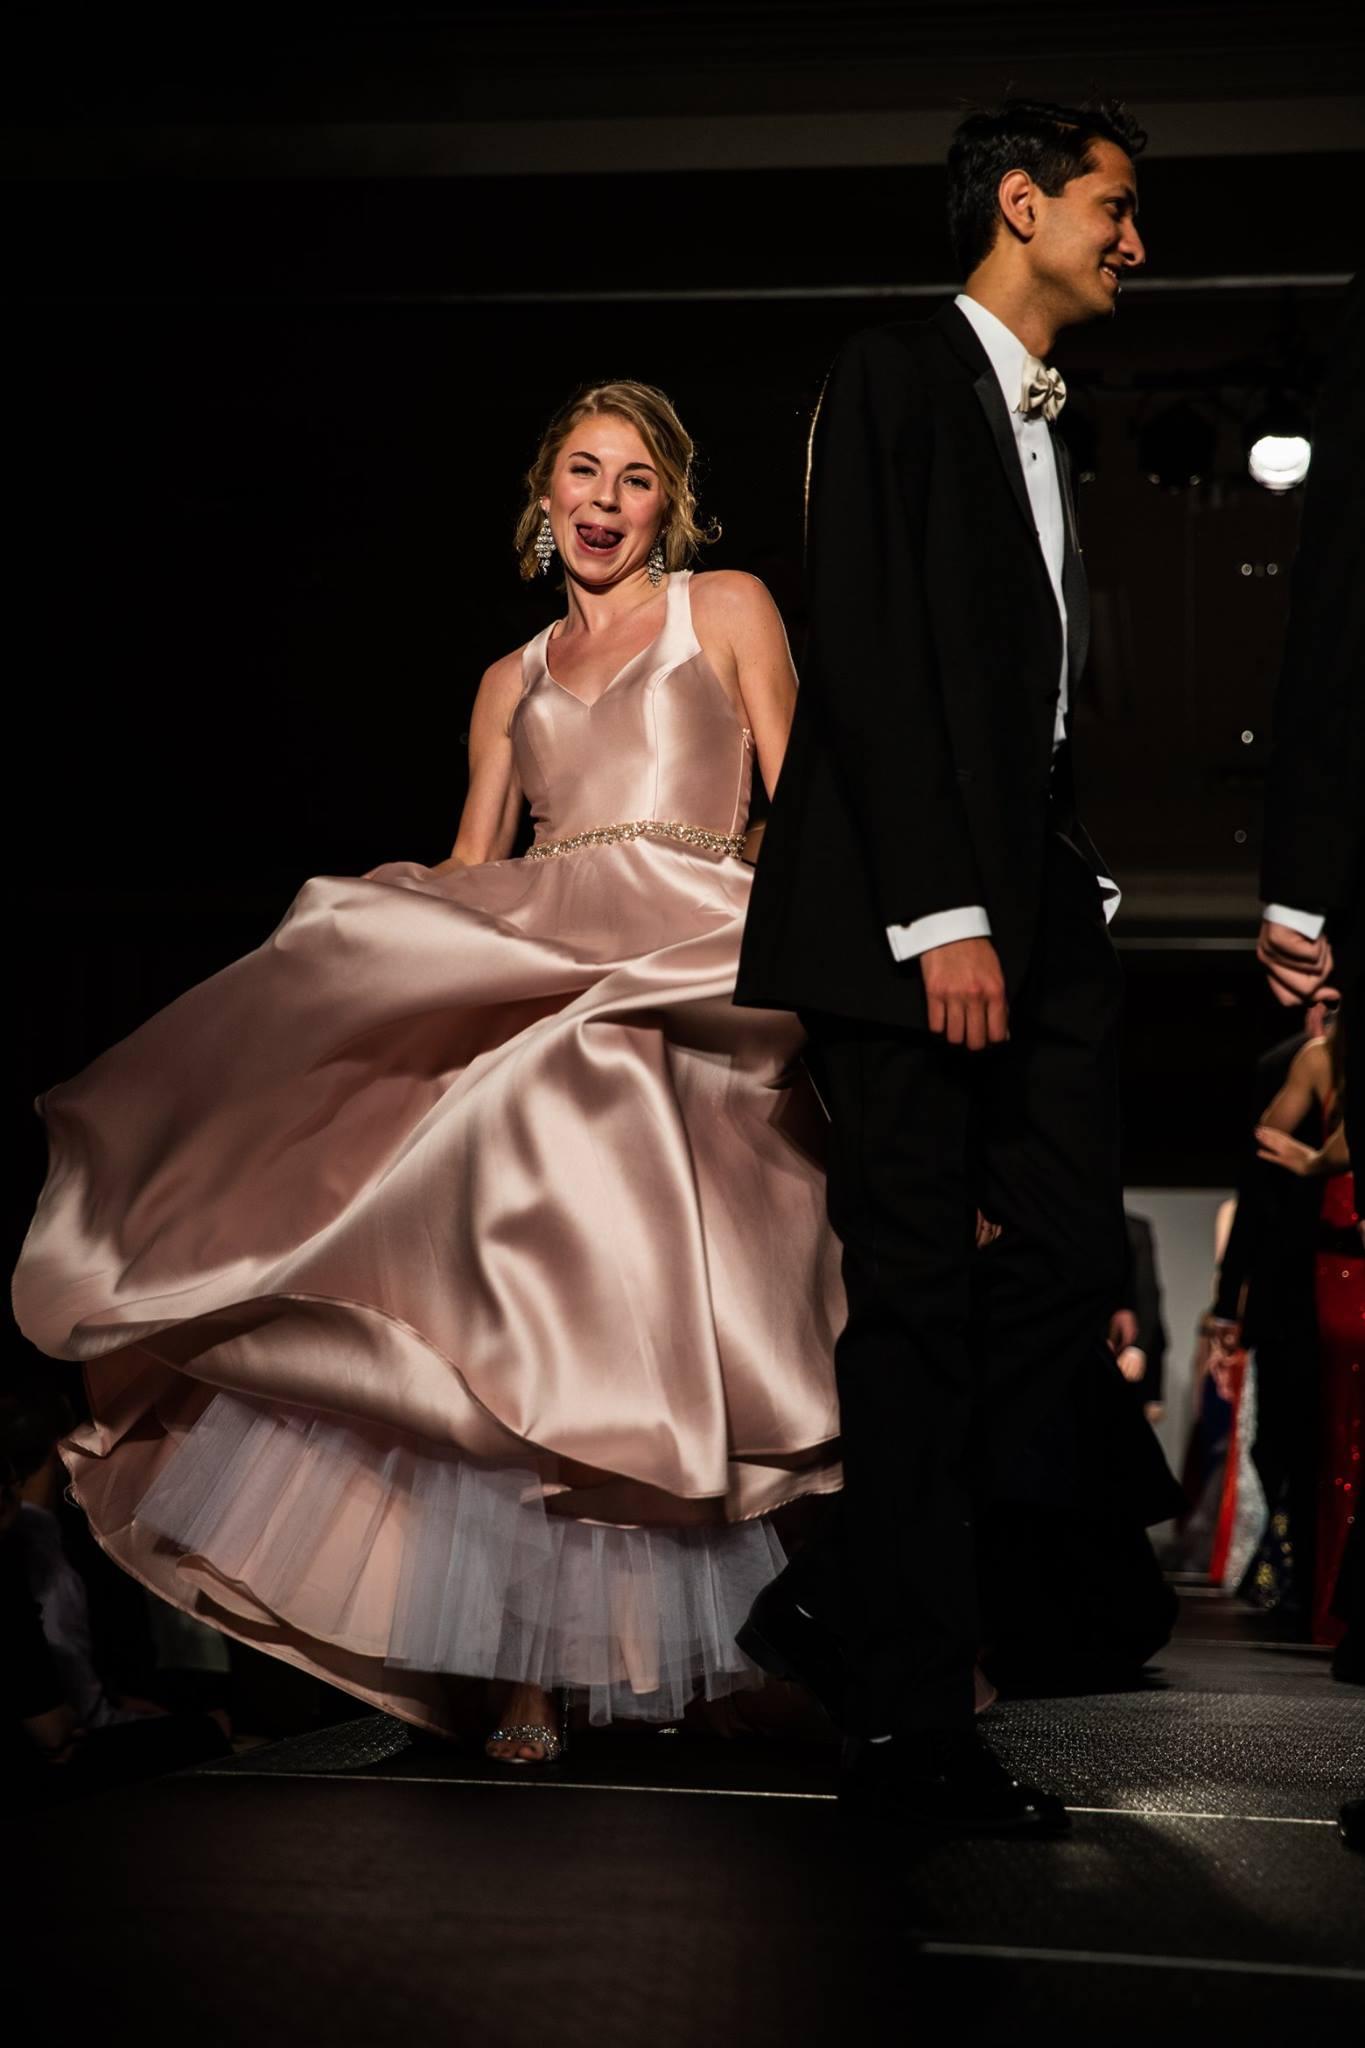 Lutheran_North_High_School_Macomb_Michigan_LHN_Fashion_Show_2019_Seniors (79).jpg